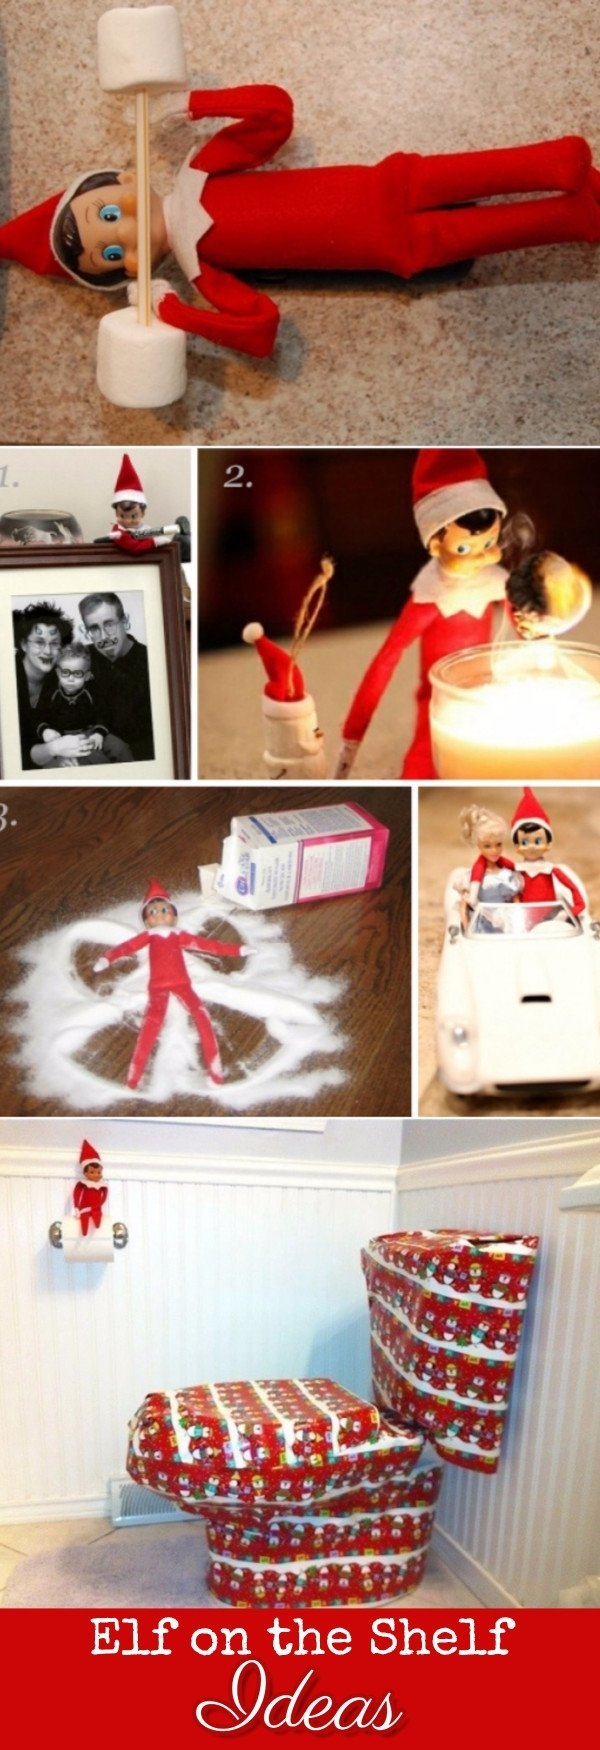 10 Unique Elf On The Self Ideas 10 elf on the shelf ideas for christmas 2017 crazy elf such pranks